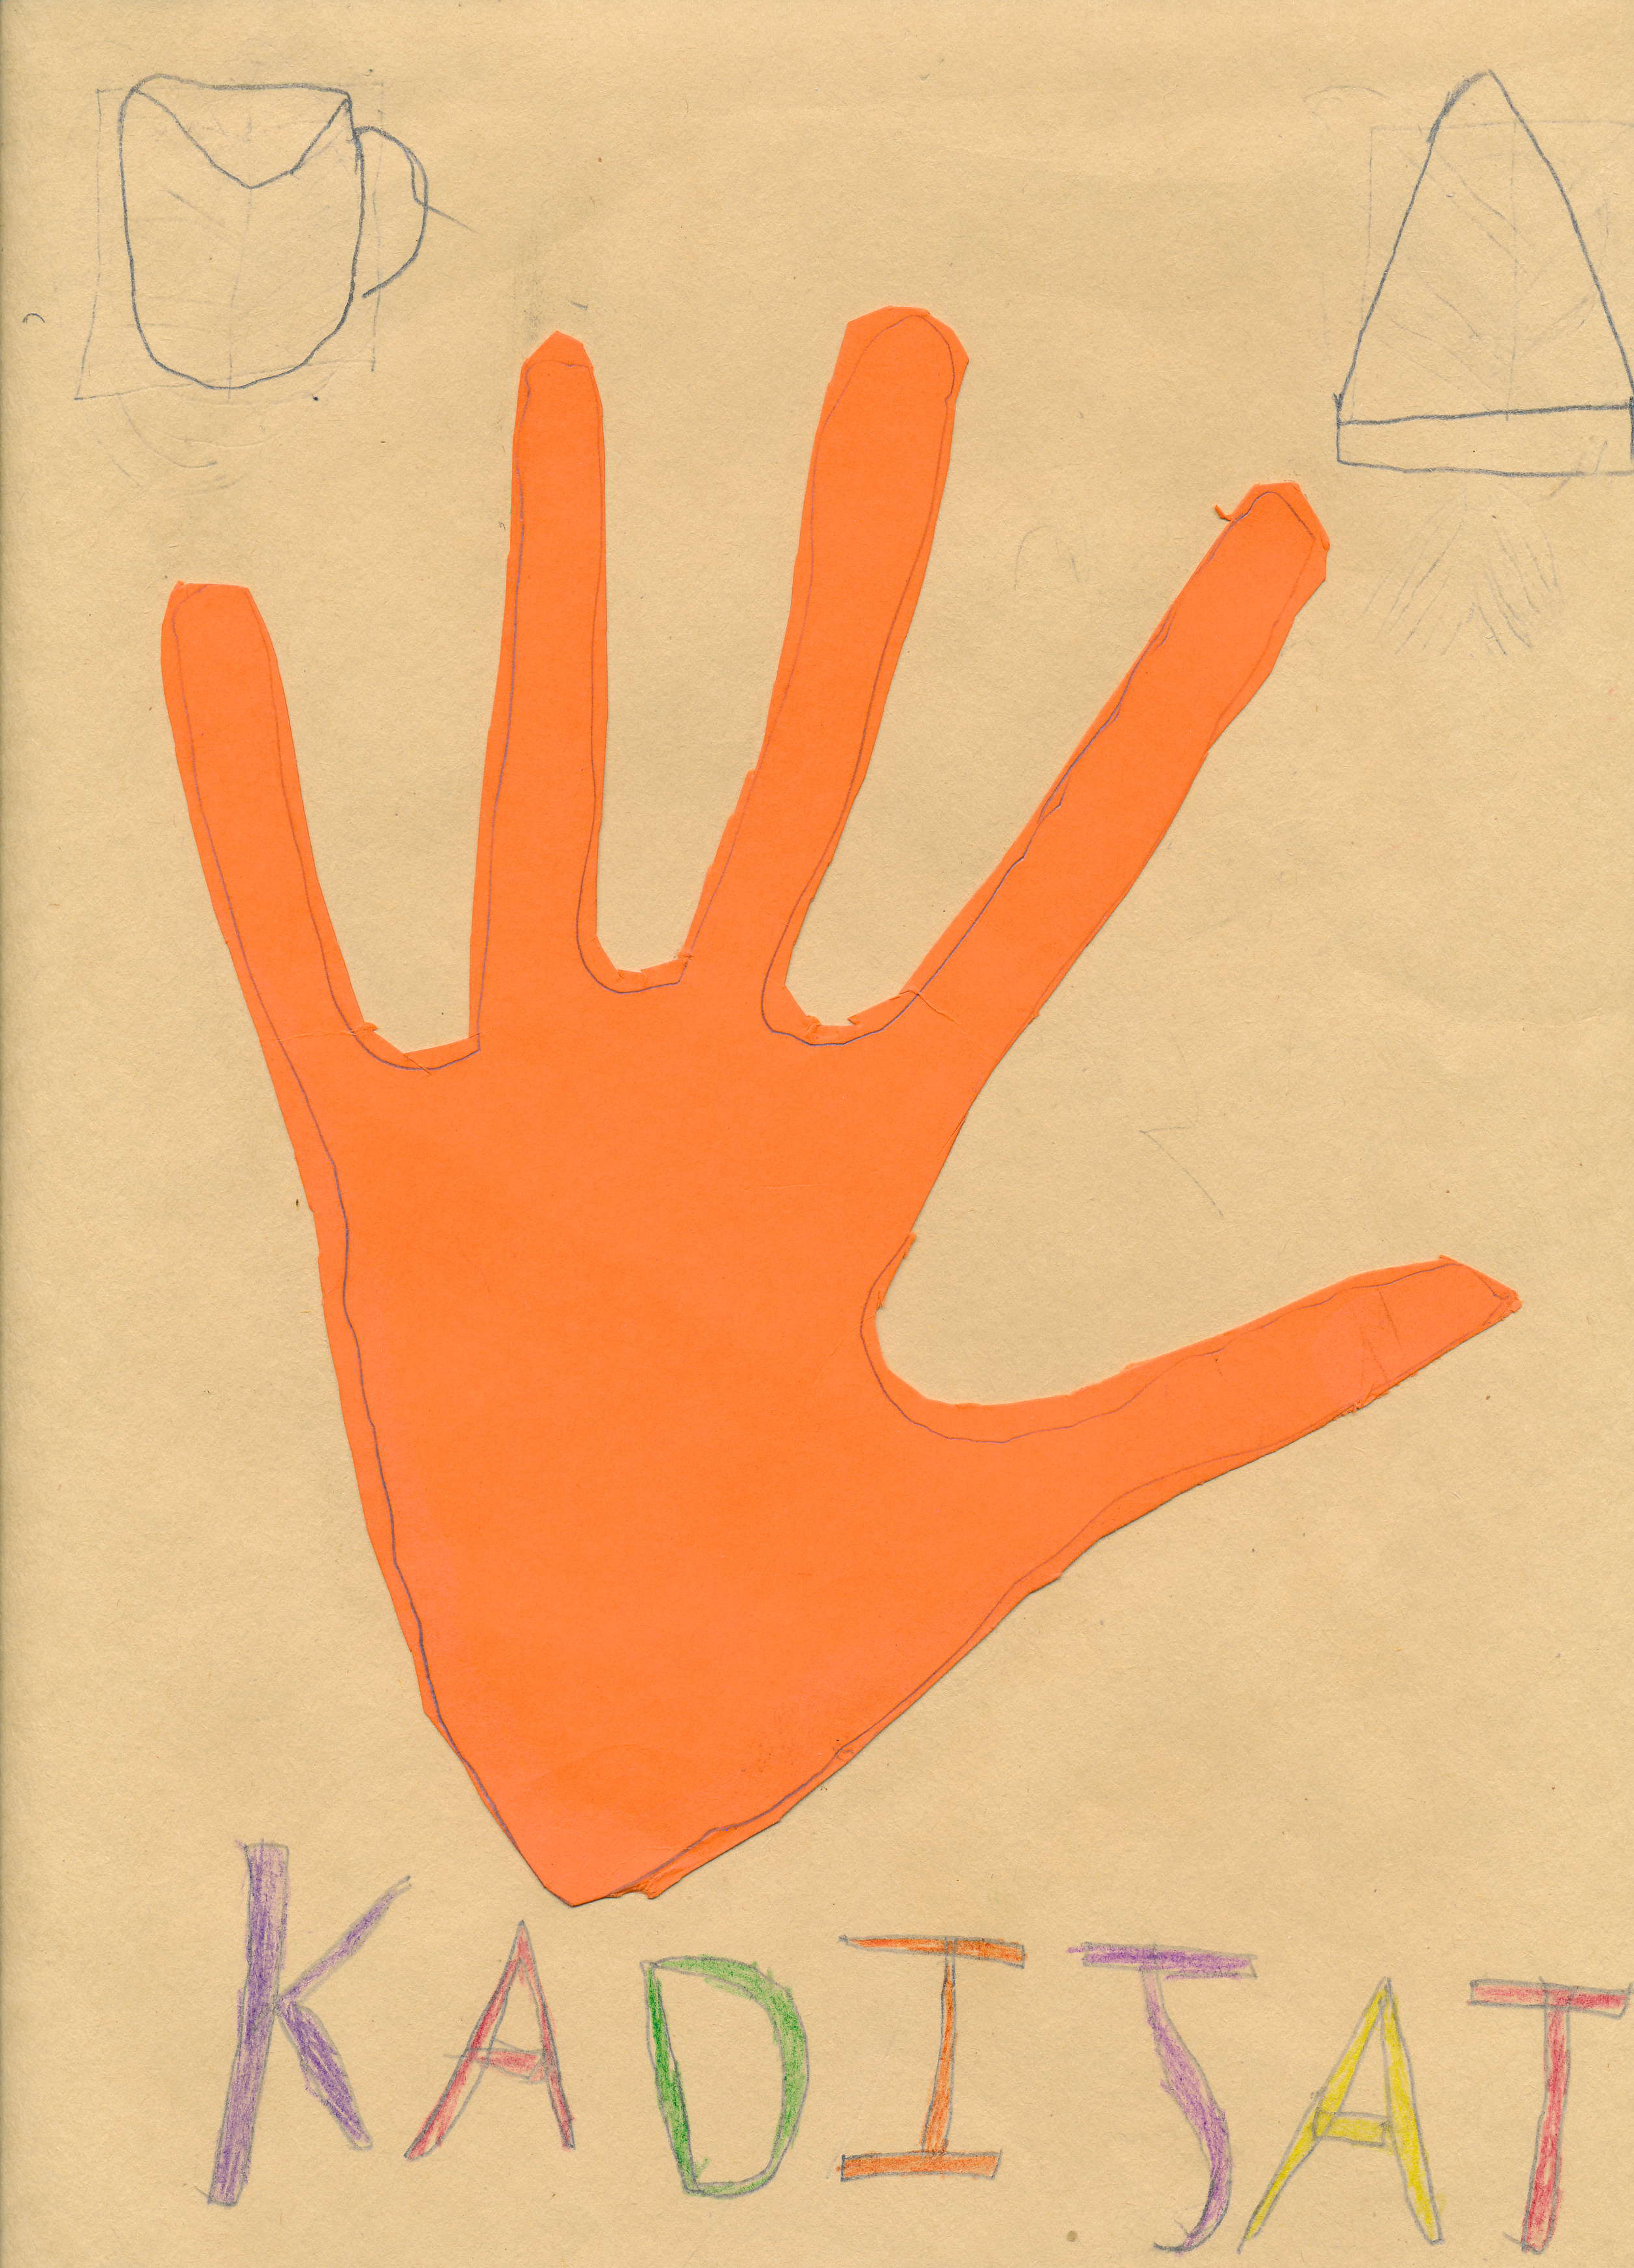 care africa child sponsorship kadijat hand print.jpg